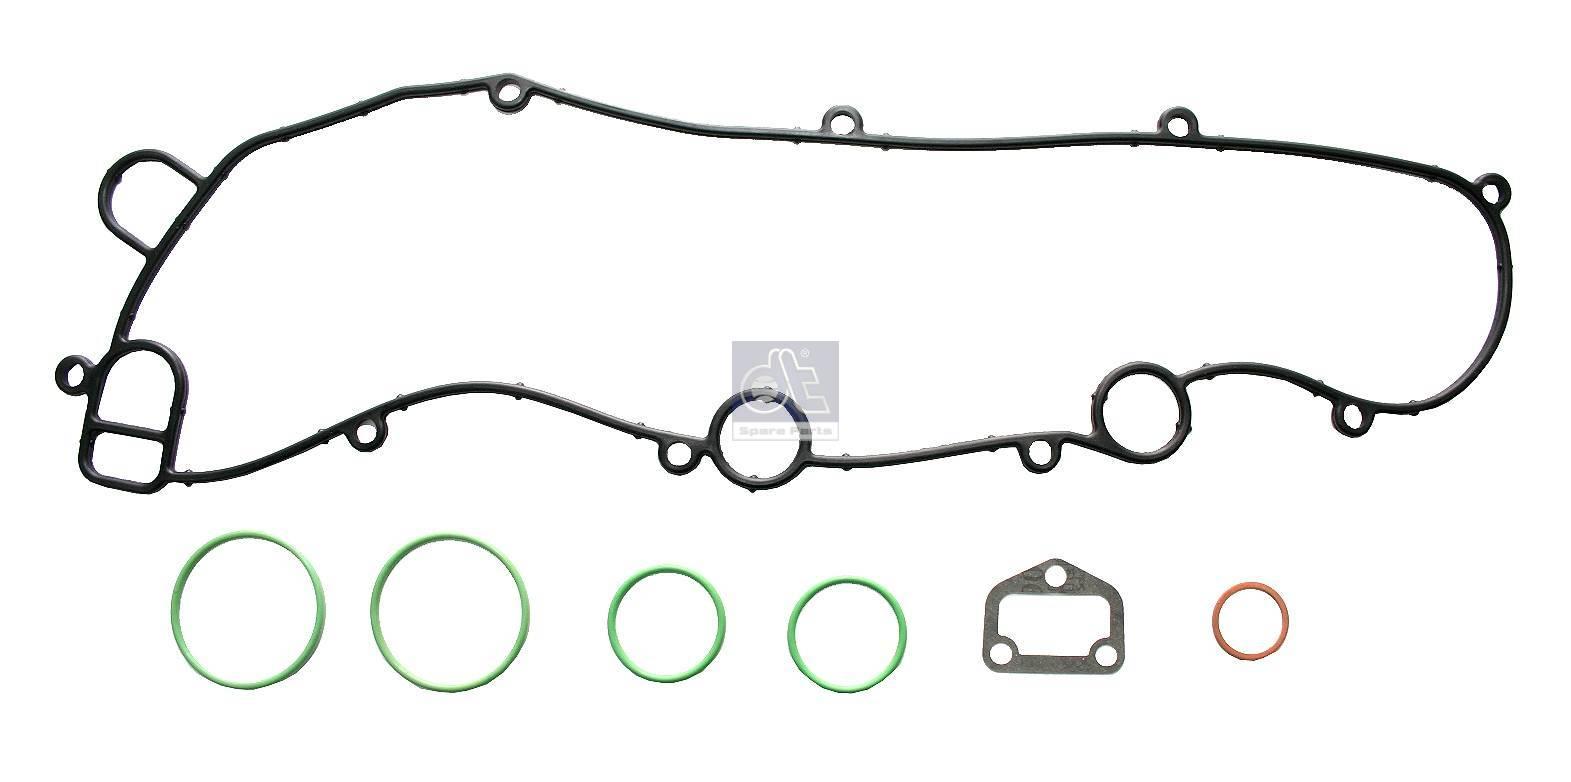 Dt 1 Gasket Kit Oil Cooler S Suitable For Scania